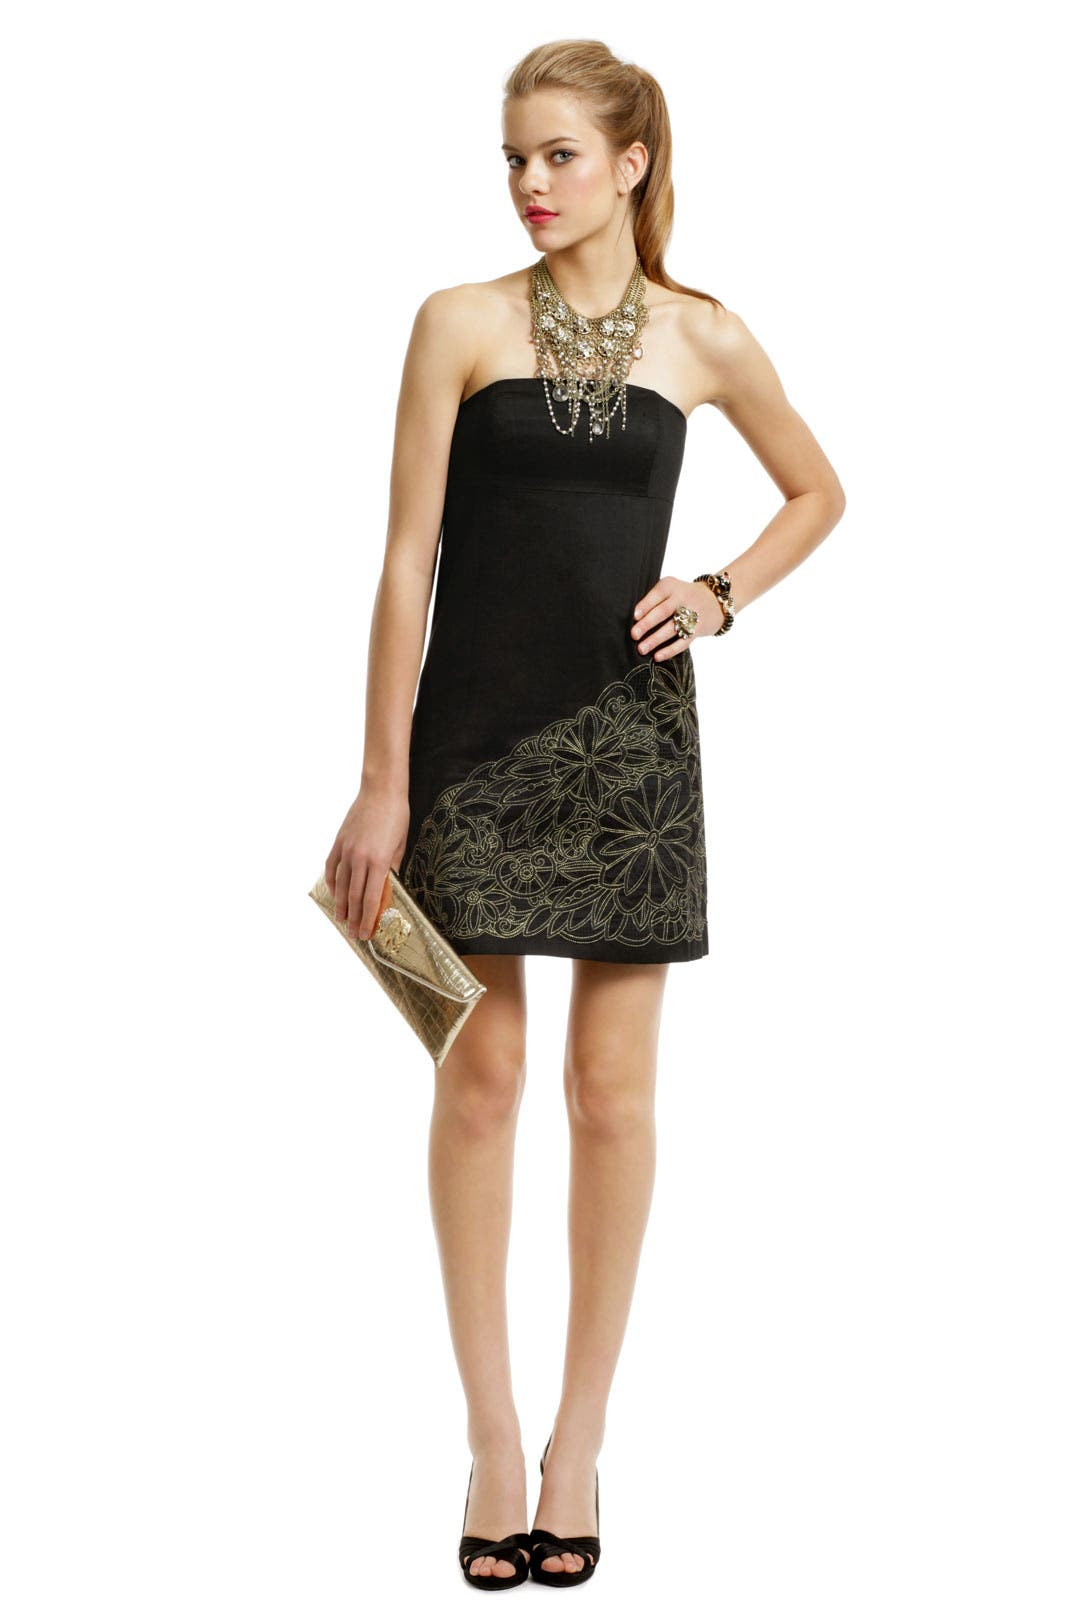 Black Bowen Dress by Lilly Pulitzer